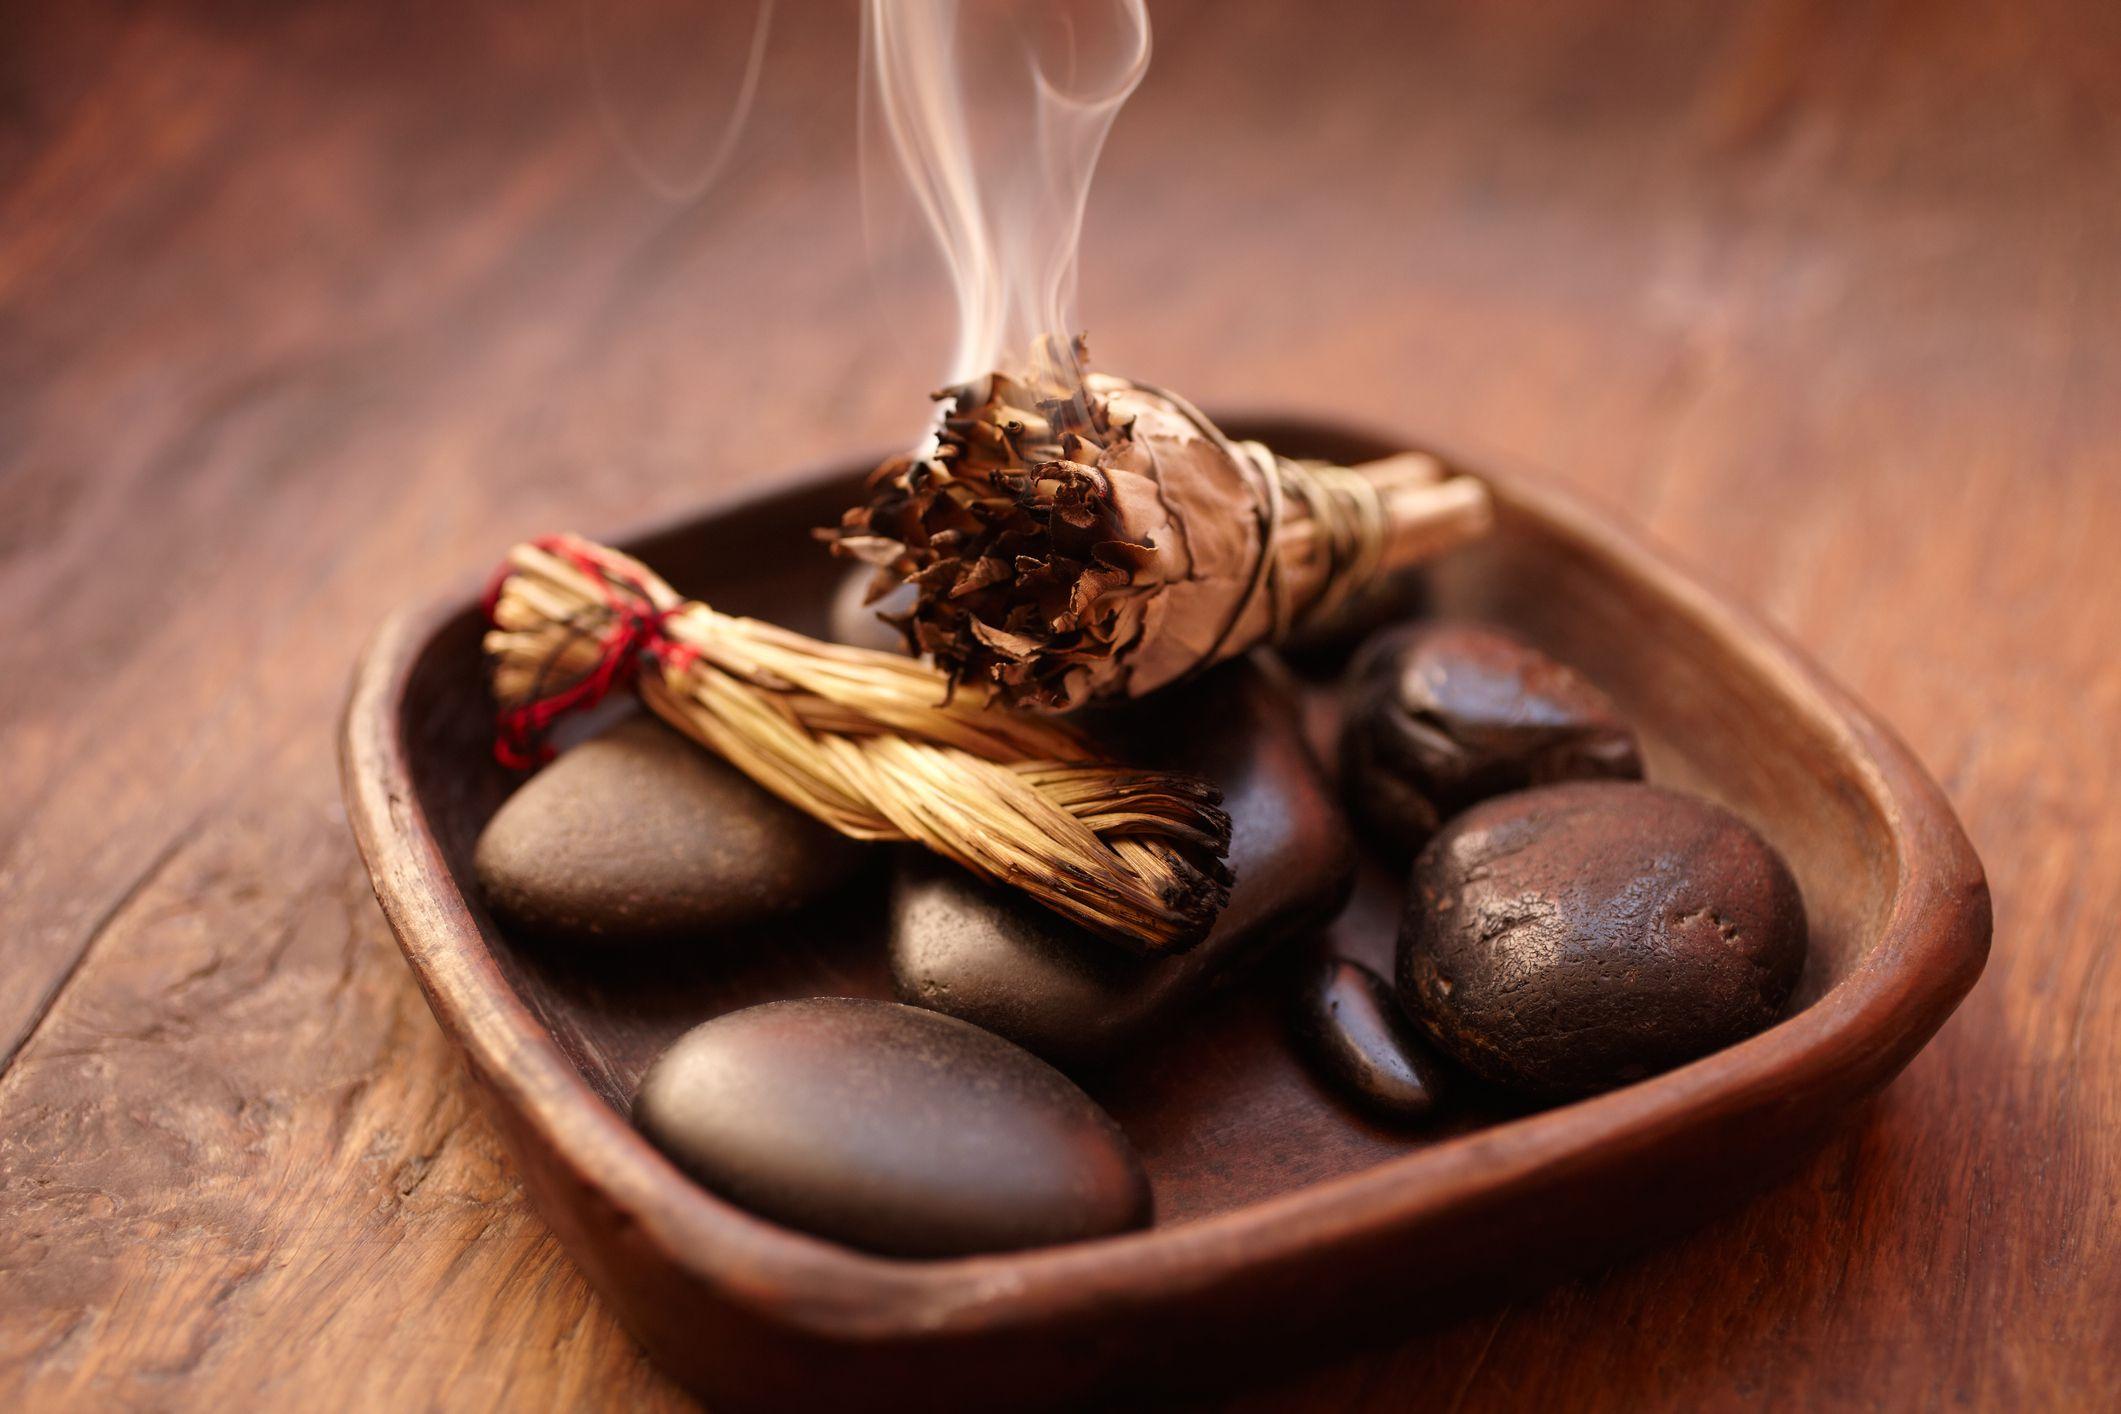 The Benefits of Burning Sage